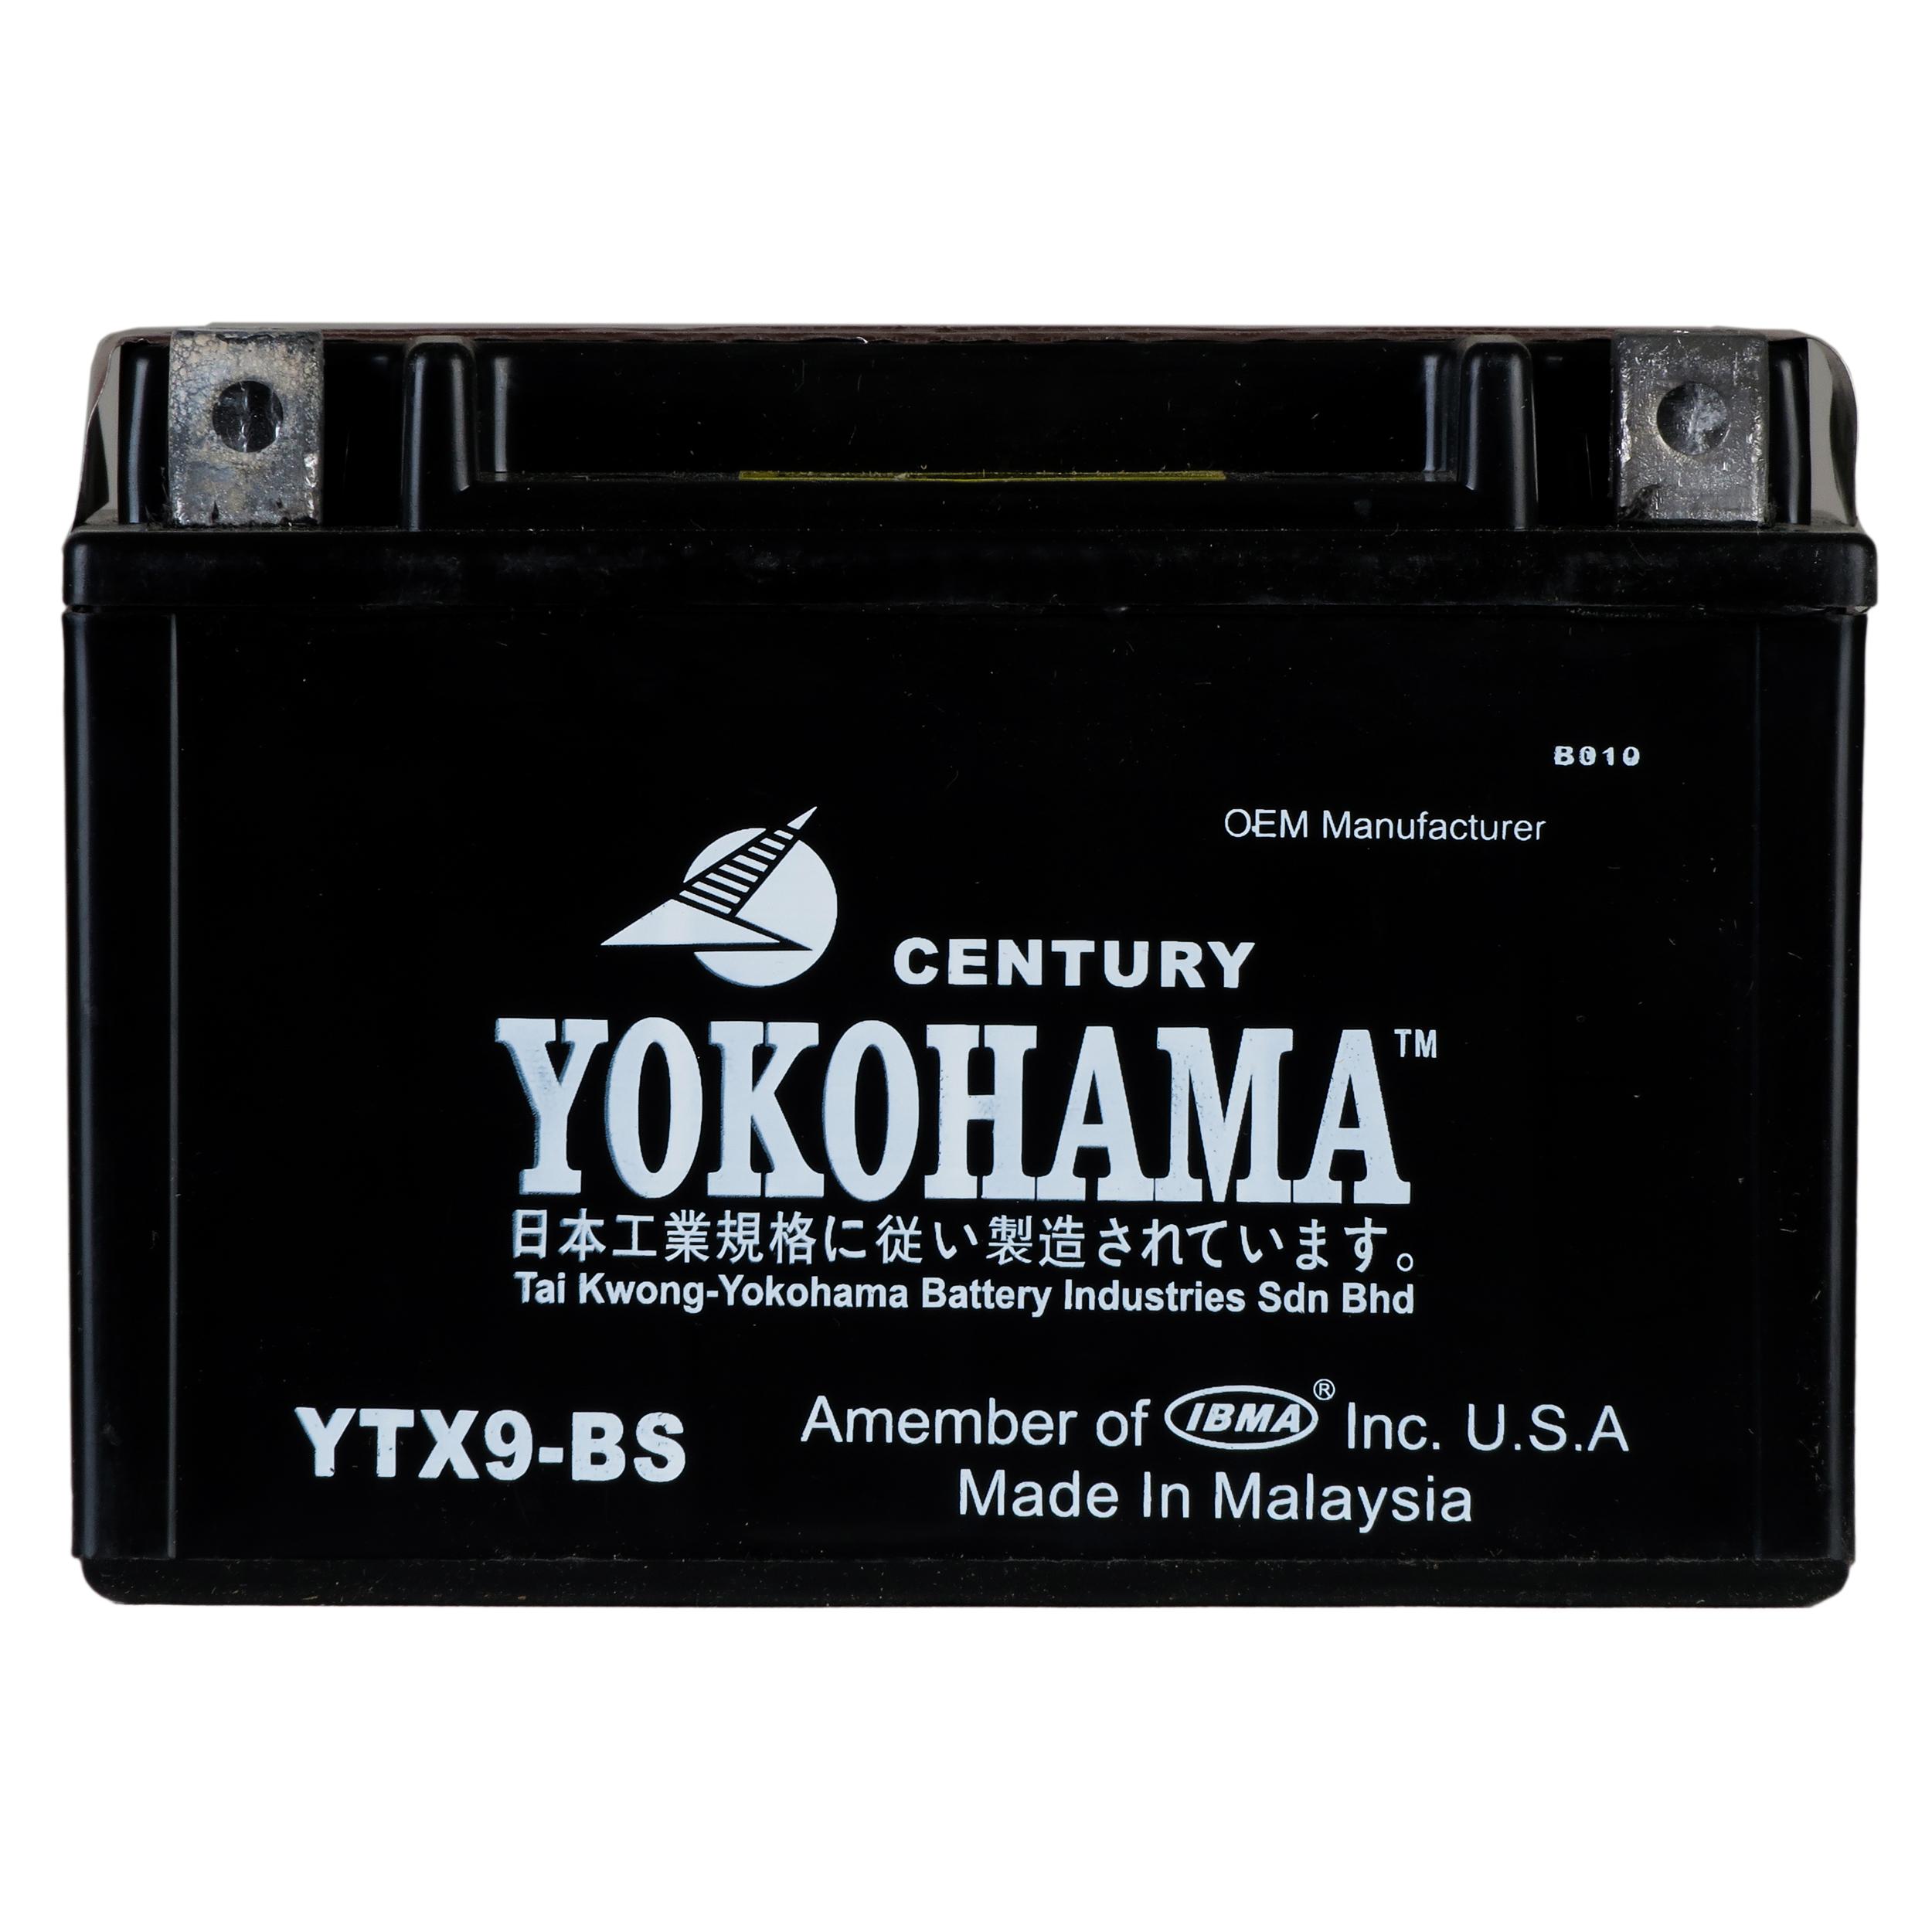 باتری موتورسیکلت یوکوهاما مدل YTX9-BS